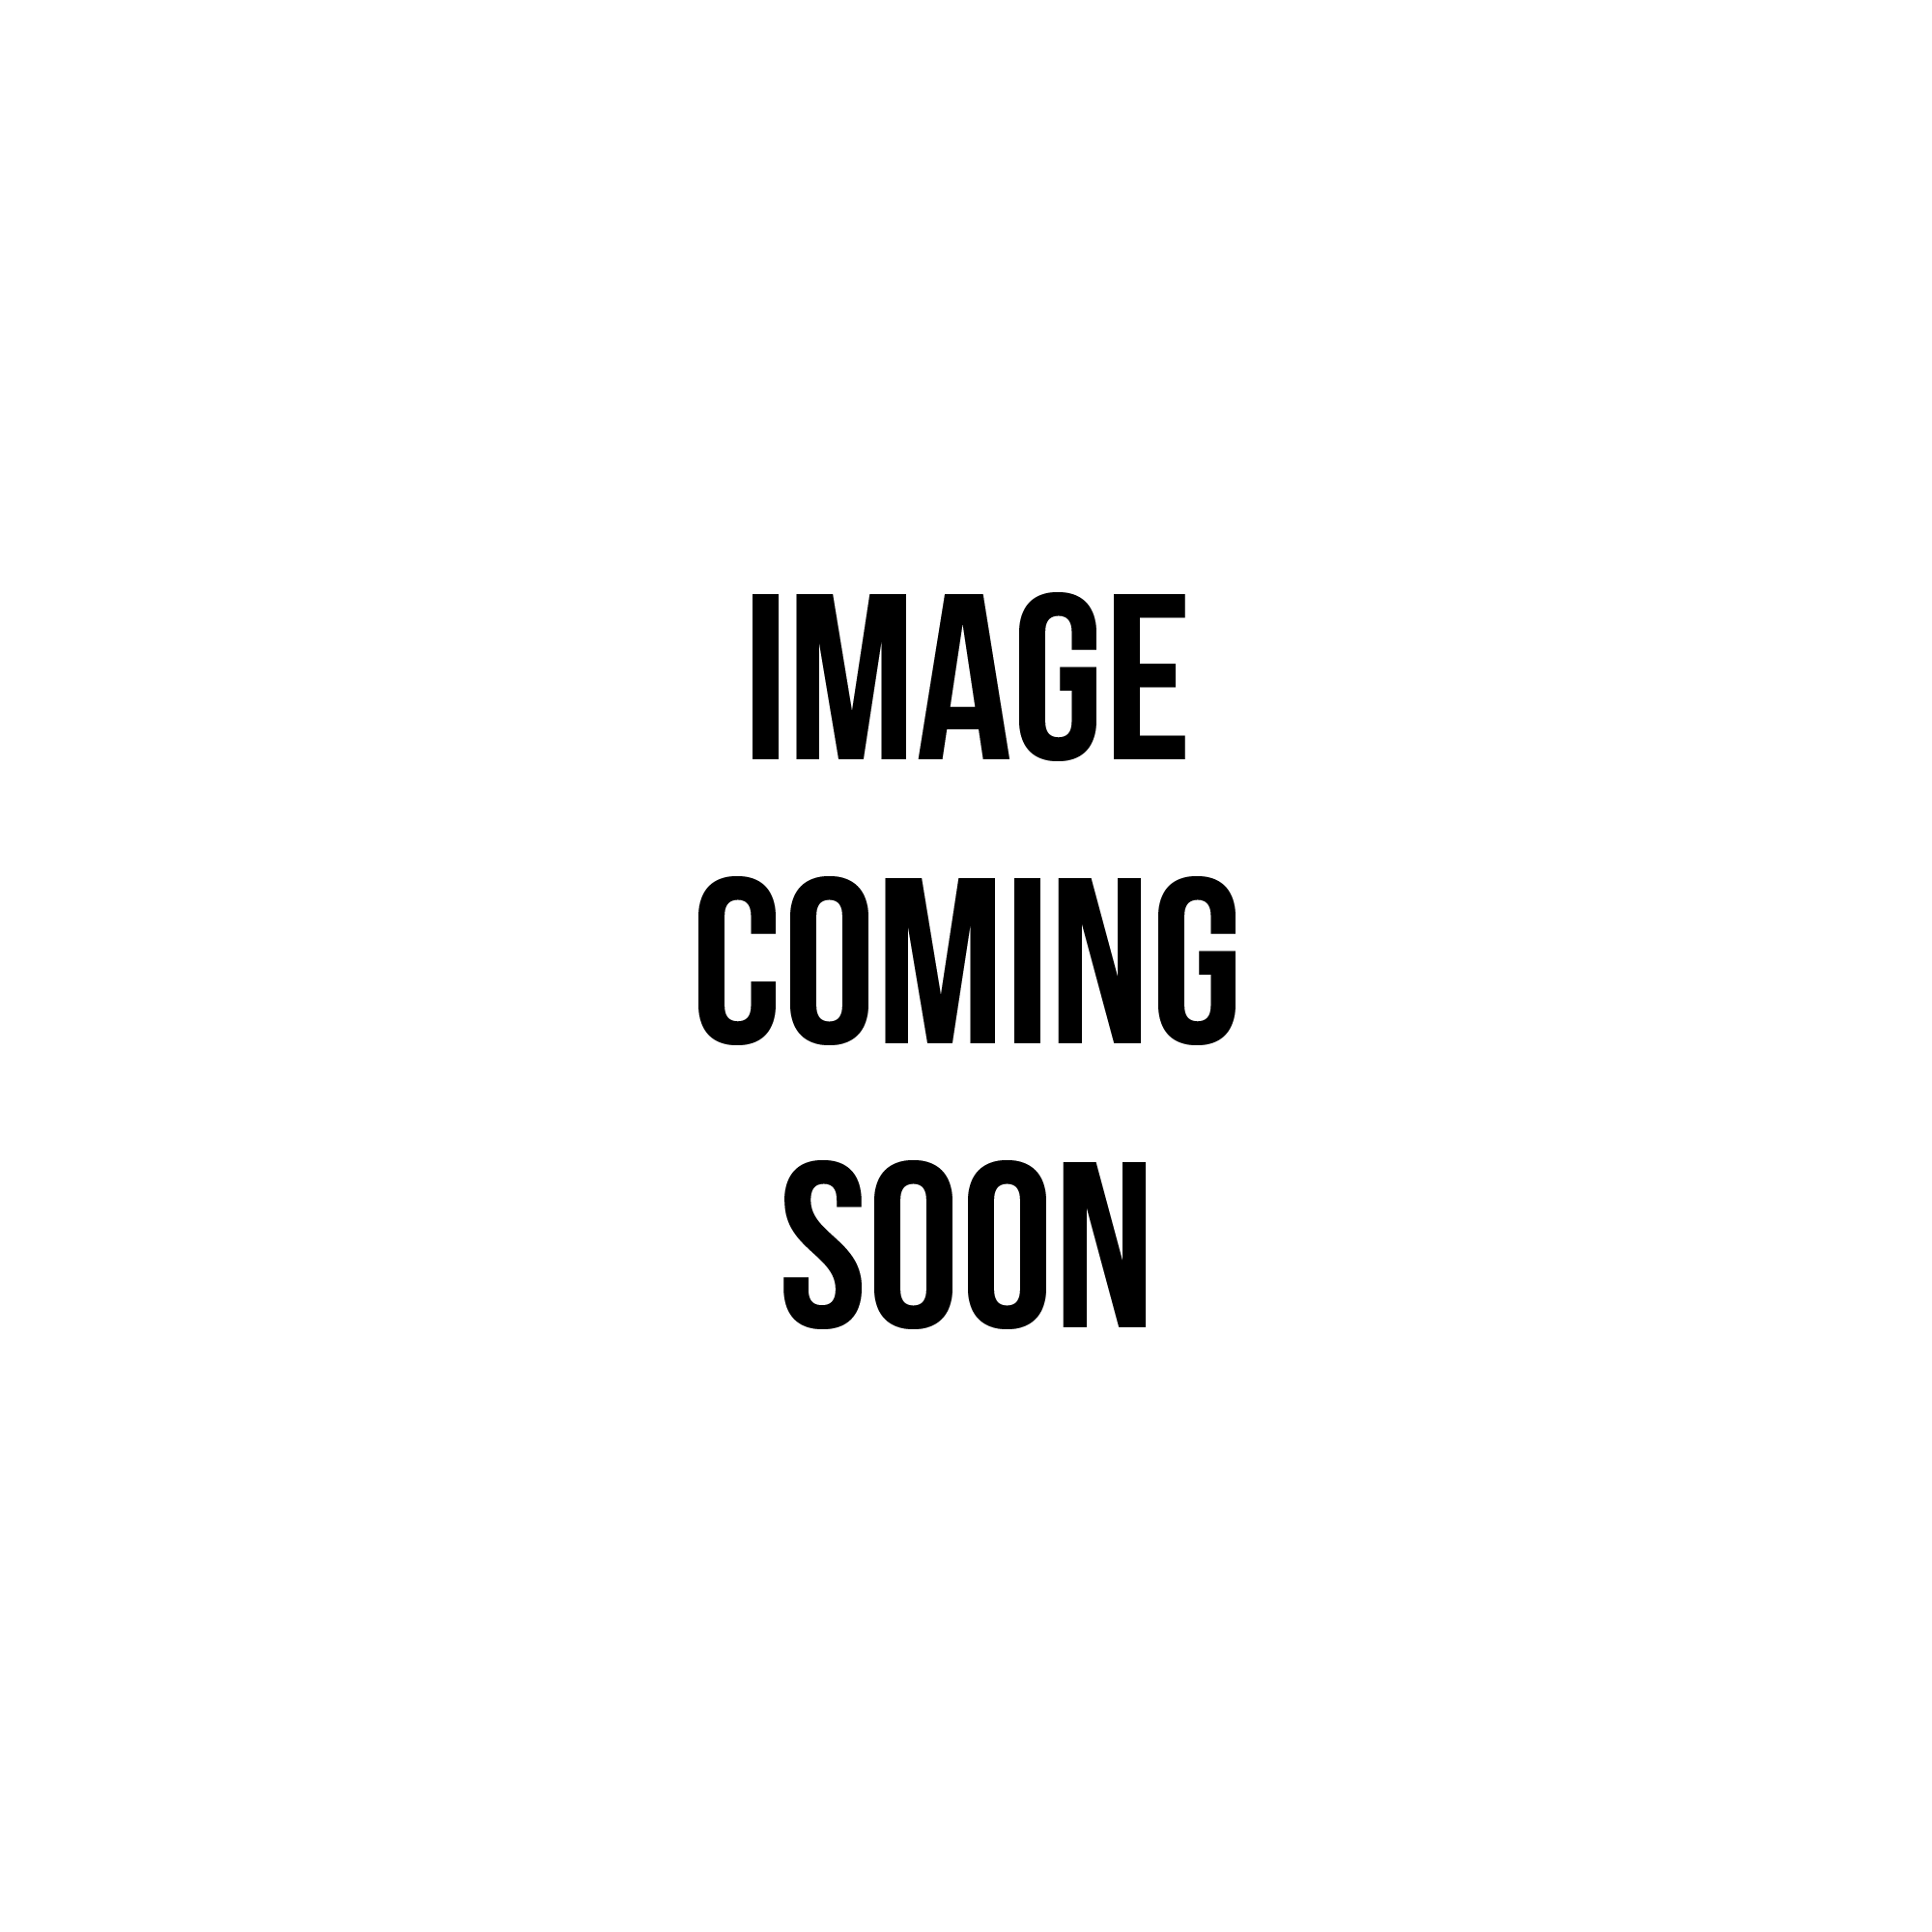 nike roshe flyknit 2, Nike Air Max 1 White Dark Grey Purple